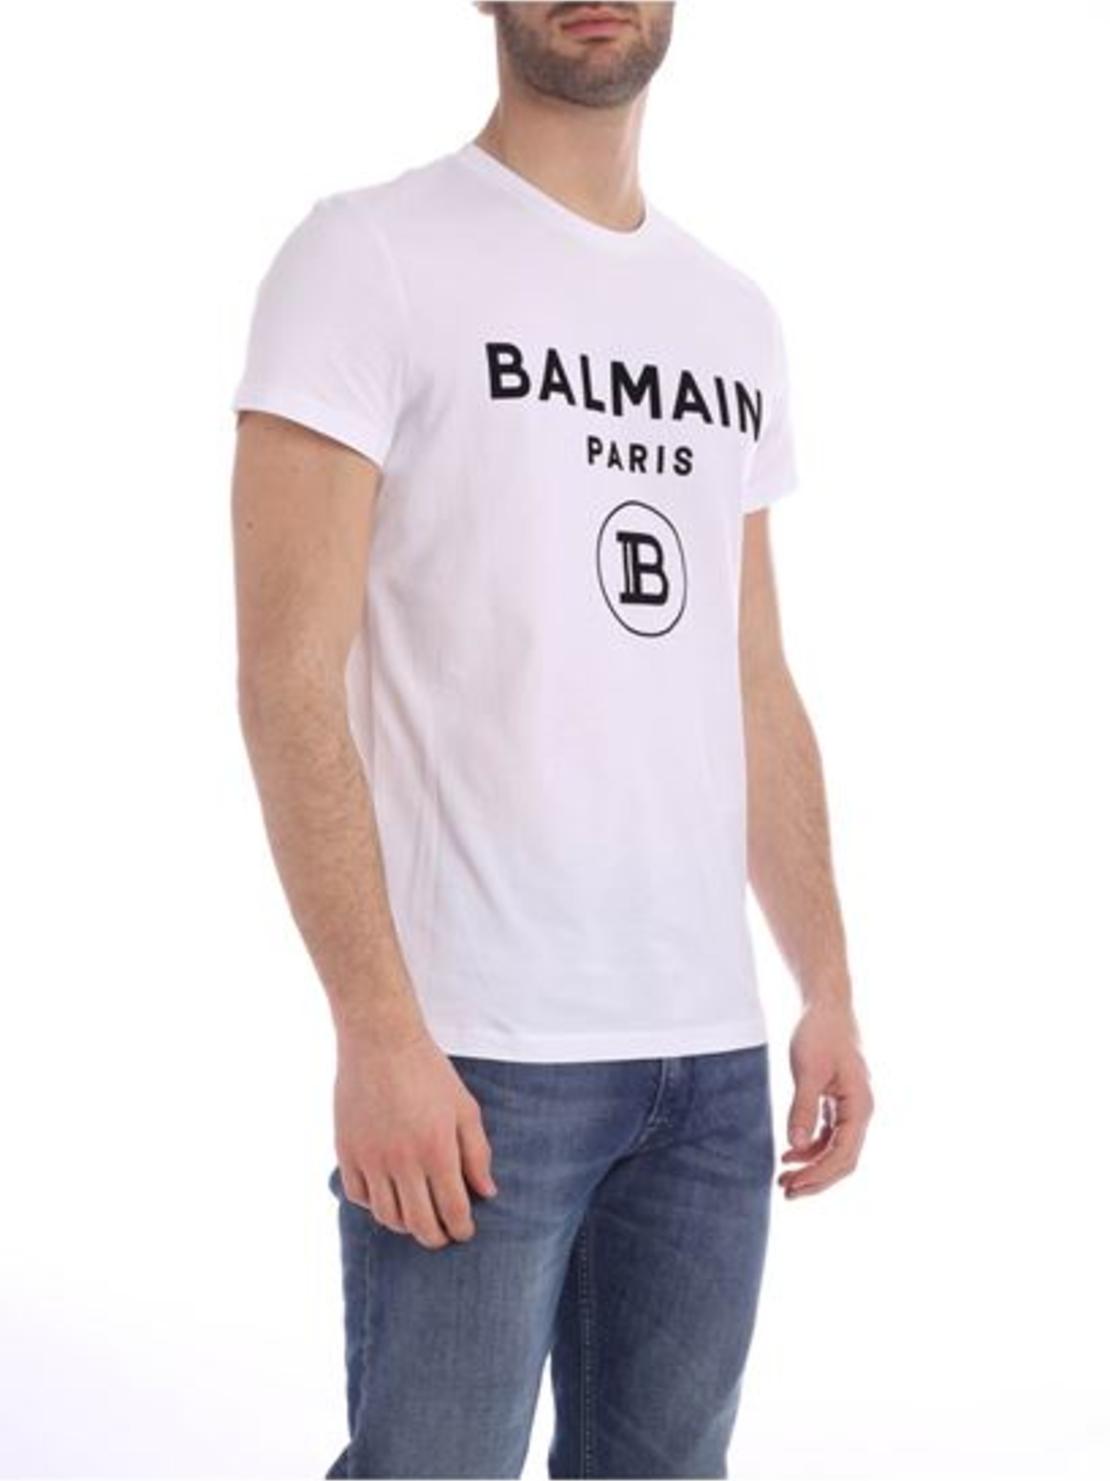 BALMAIN - T-SHIRT FLOCK LOGO